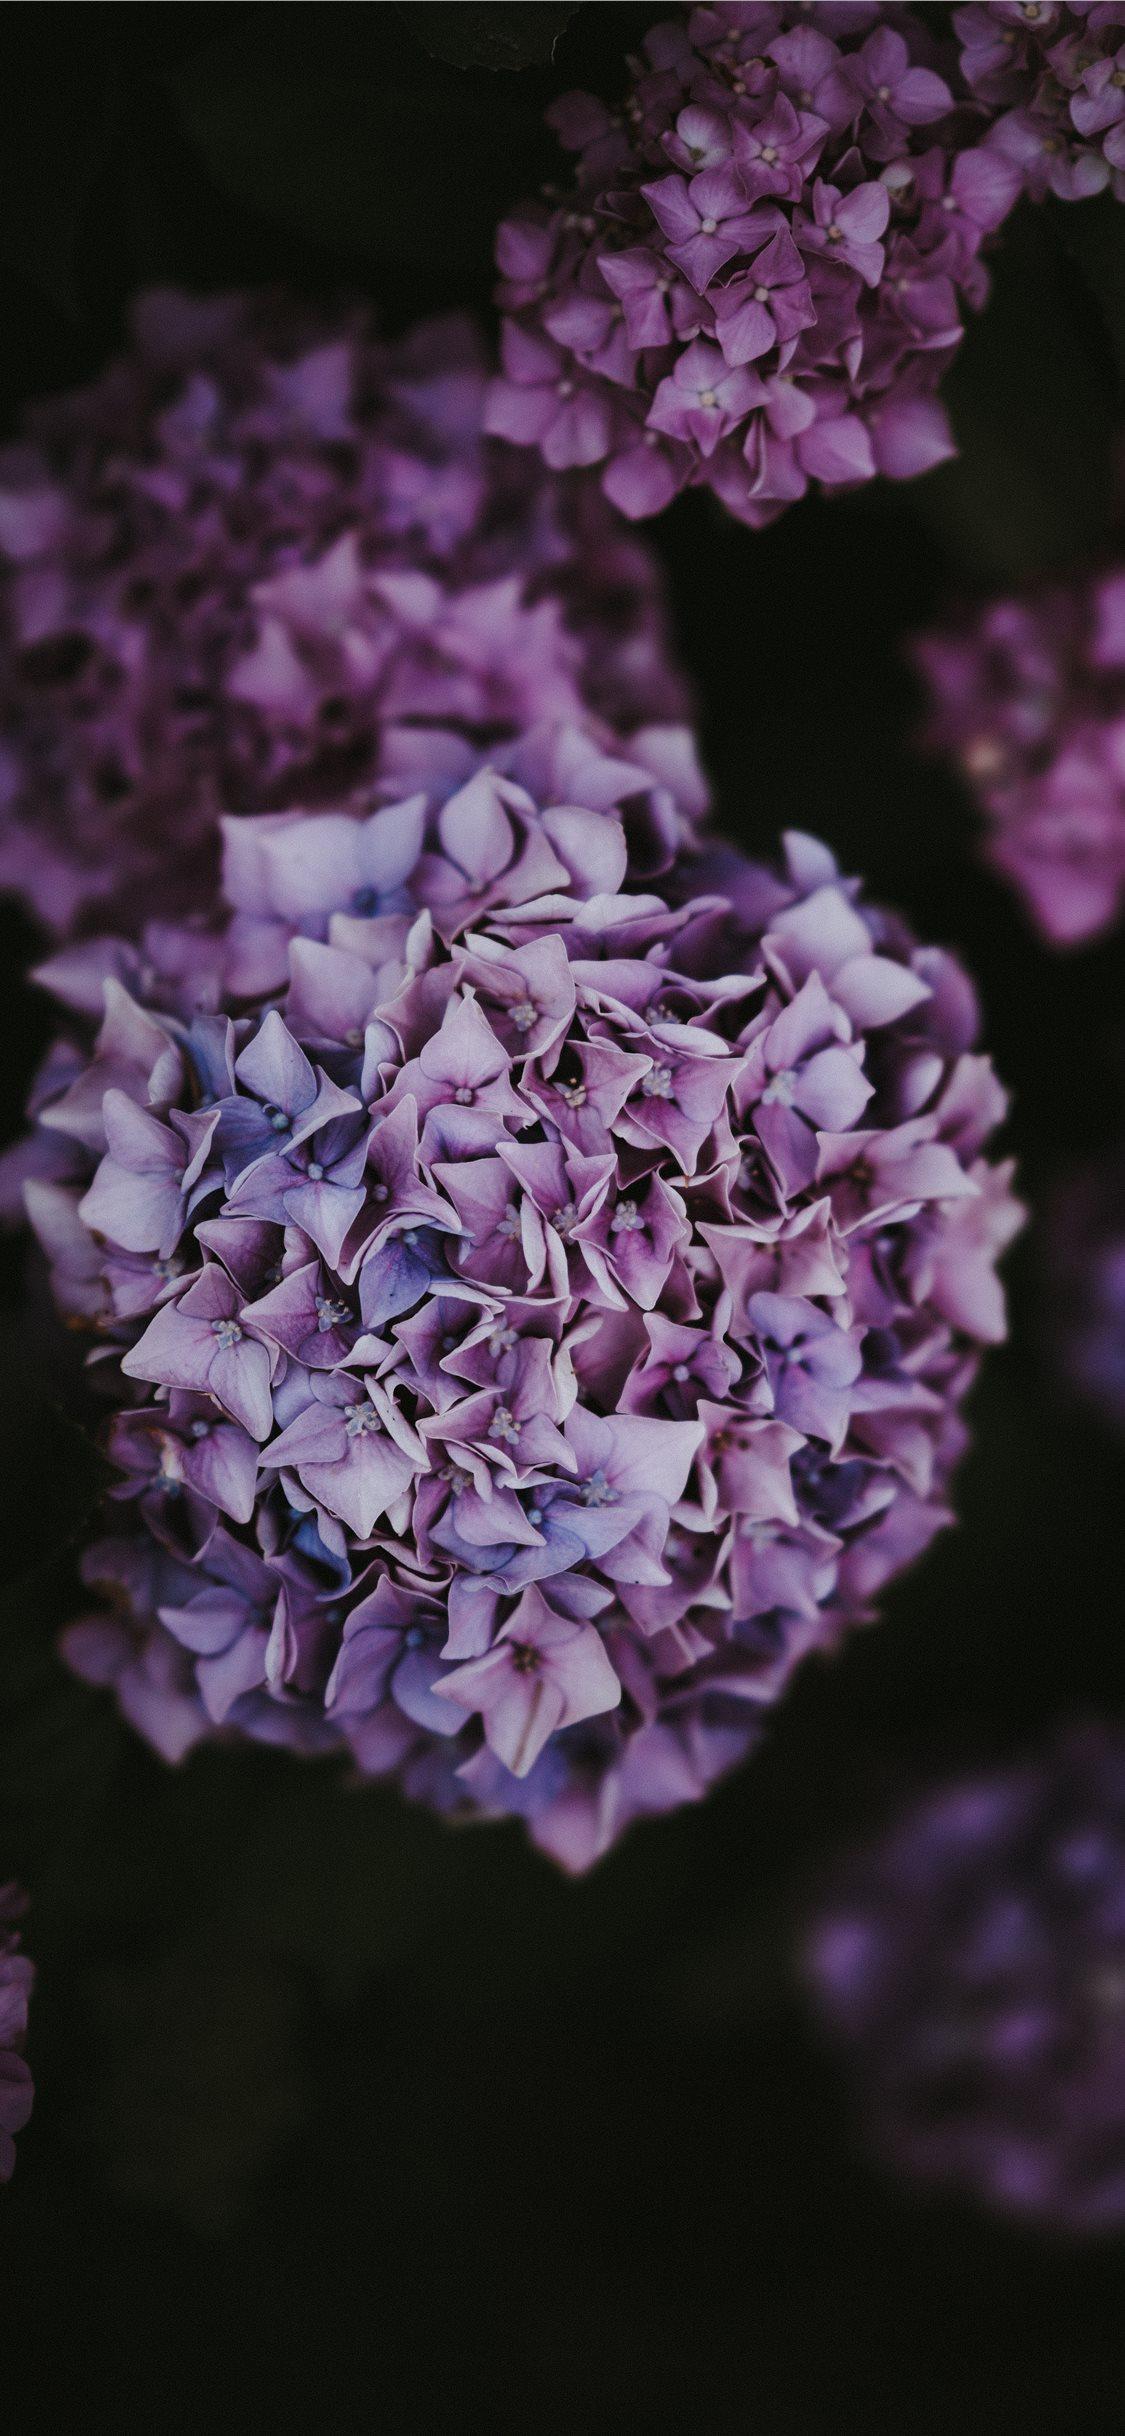 Hydrangea iPhone X wallpaper